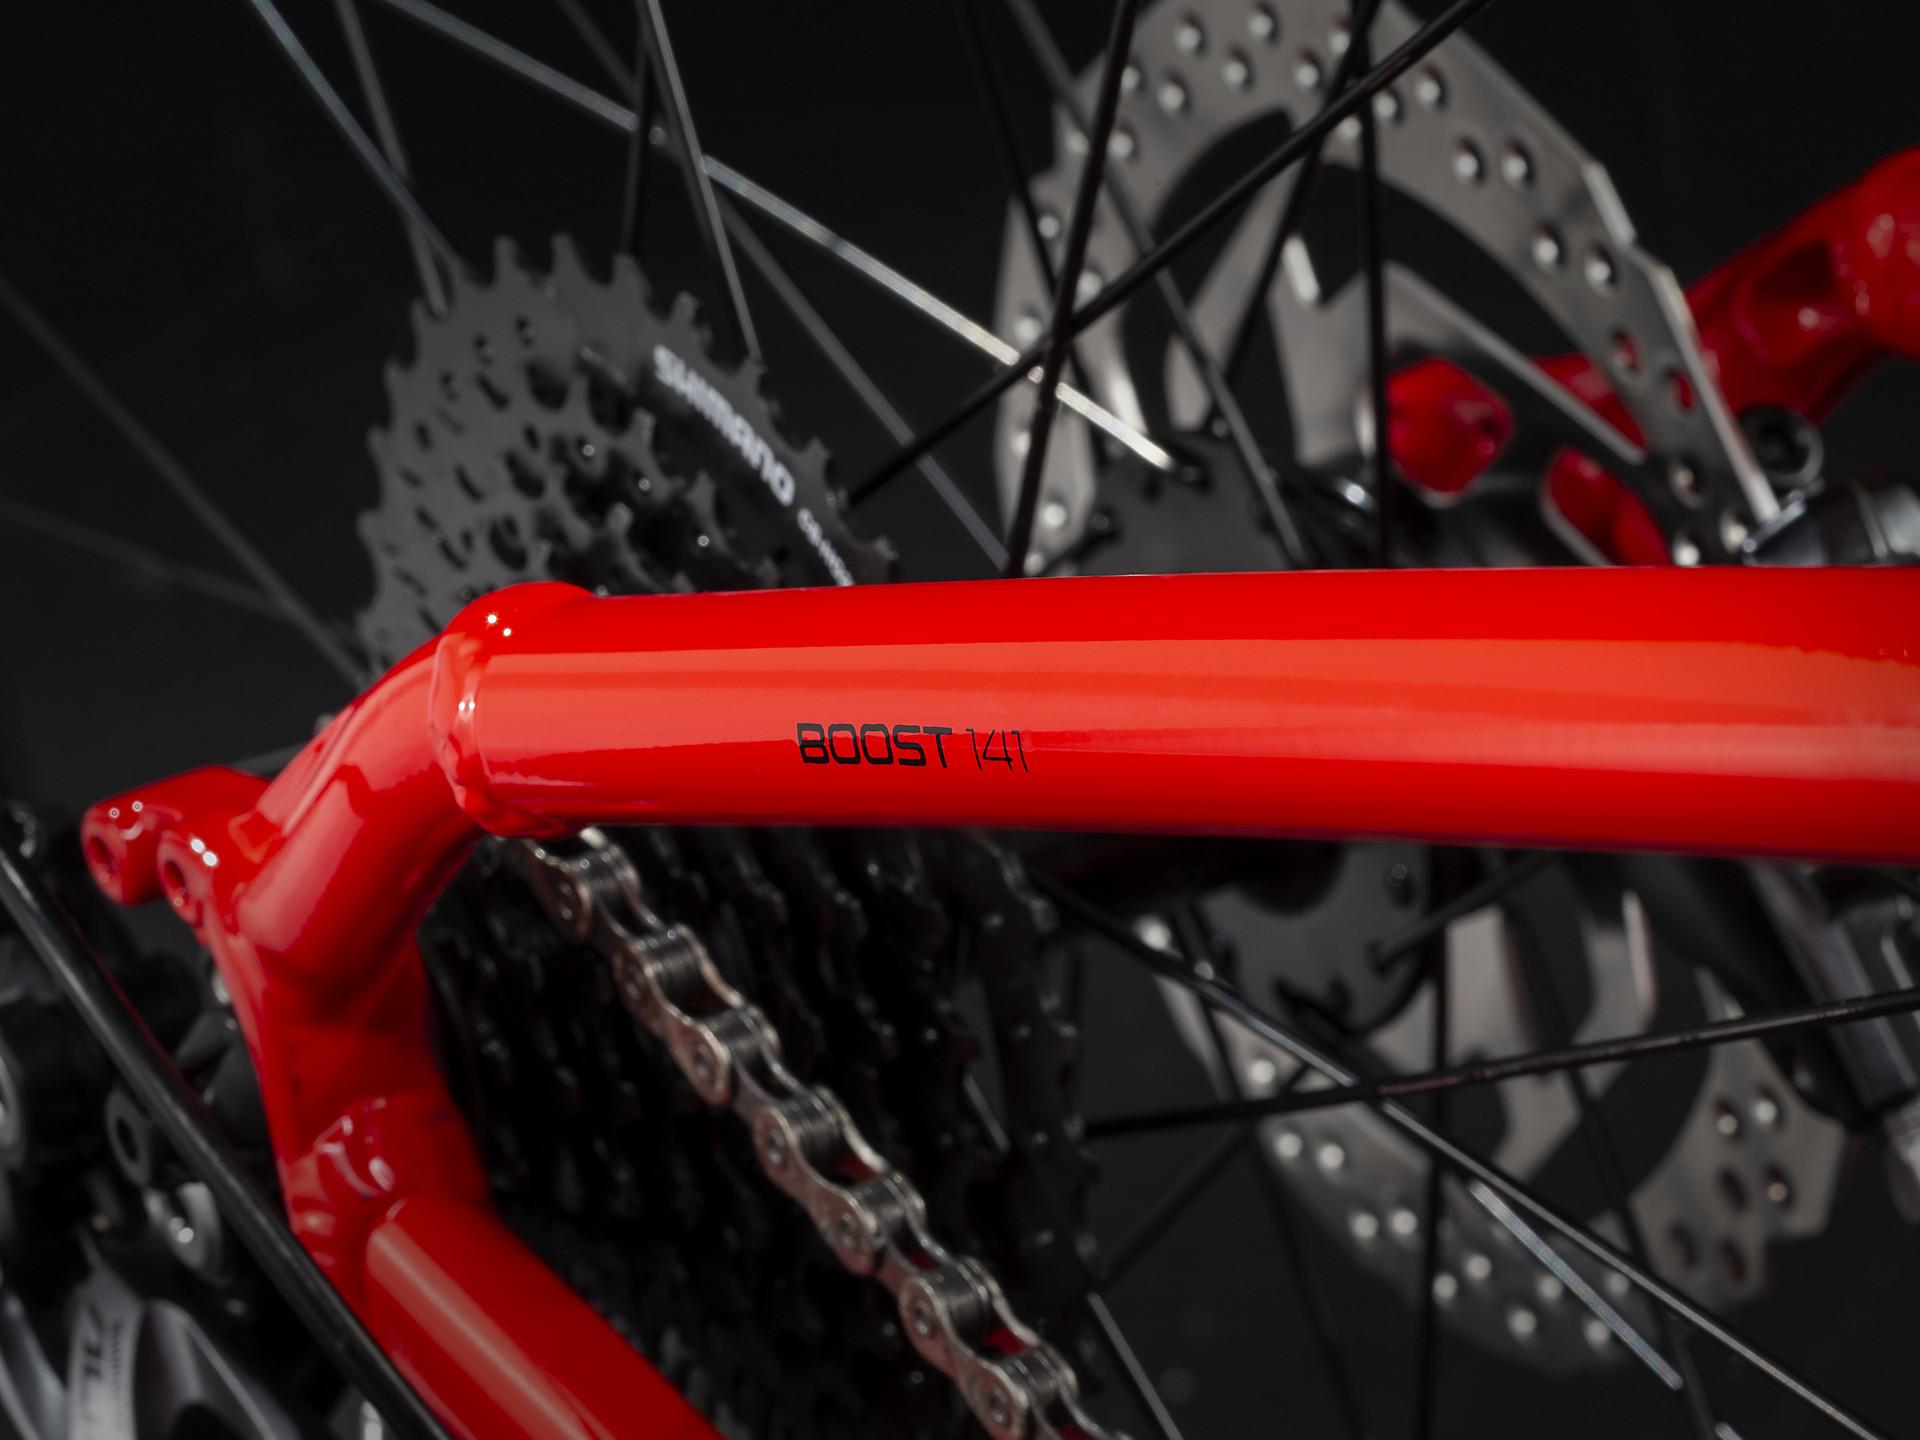 Trek Updates X-Caliber, Says It's the Perfect Mountain Bike for NICA Racing - Singletracks Mountain Bike News